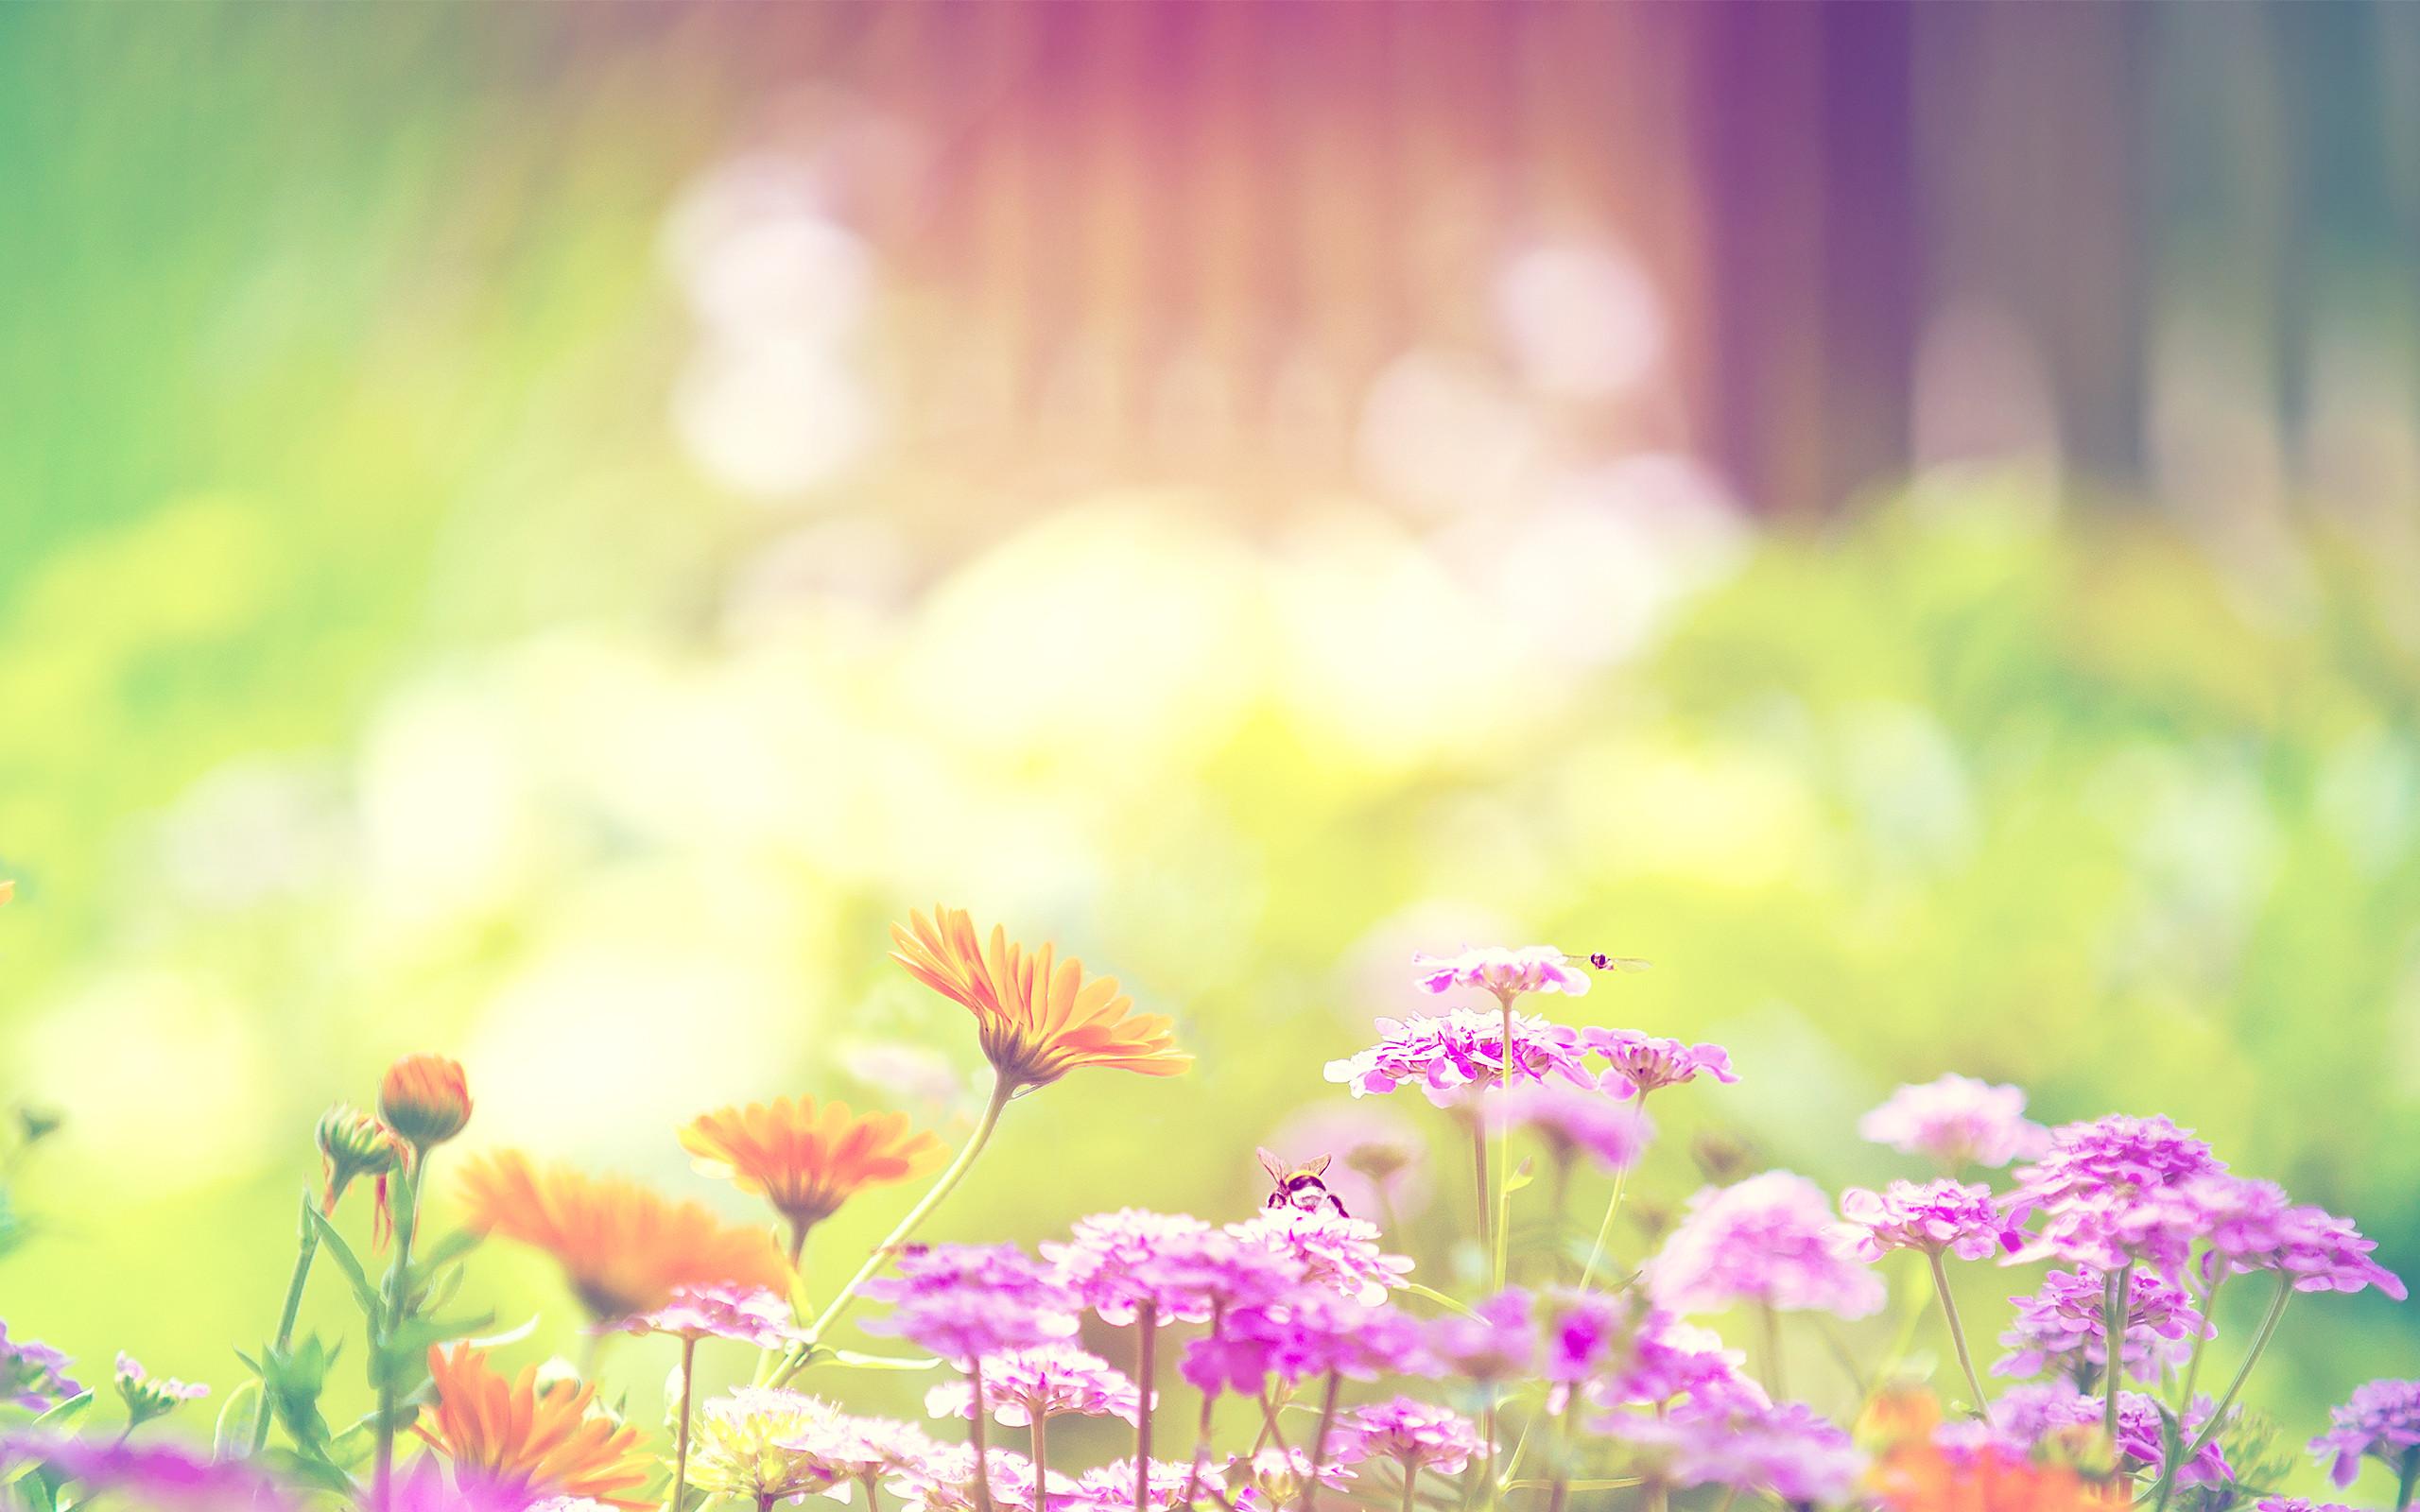 wallpaper.wiki-Flower-of-life-spring-wallpaper-PIC-